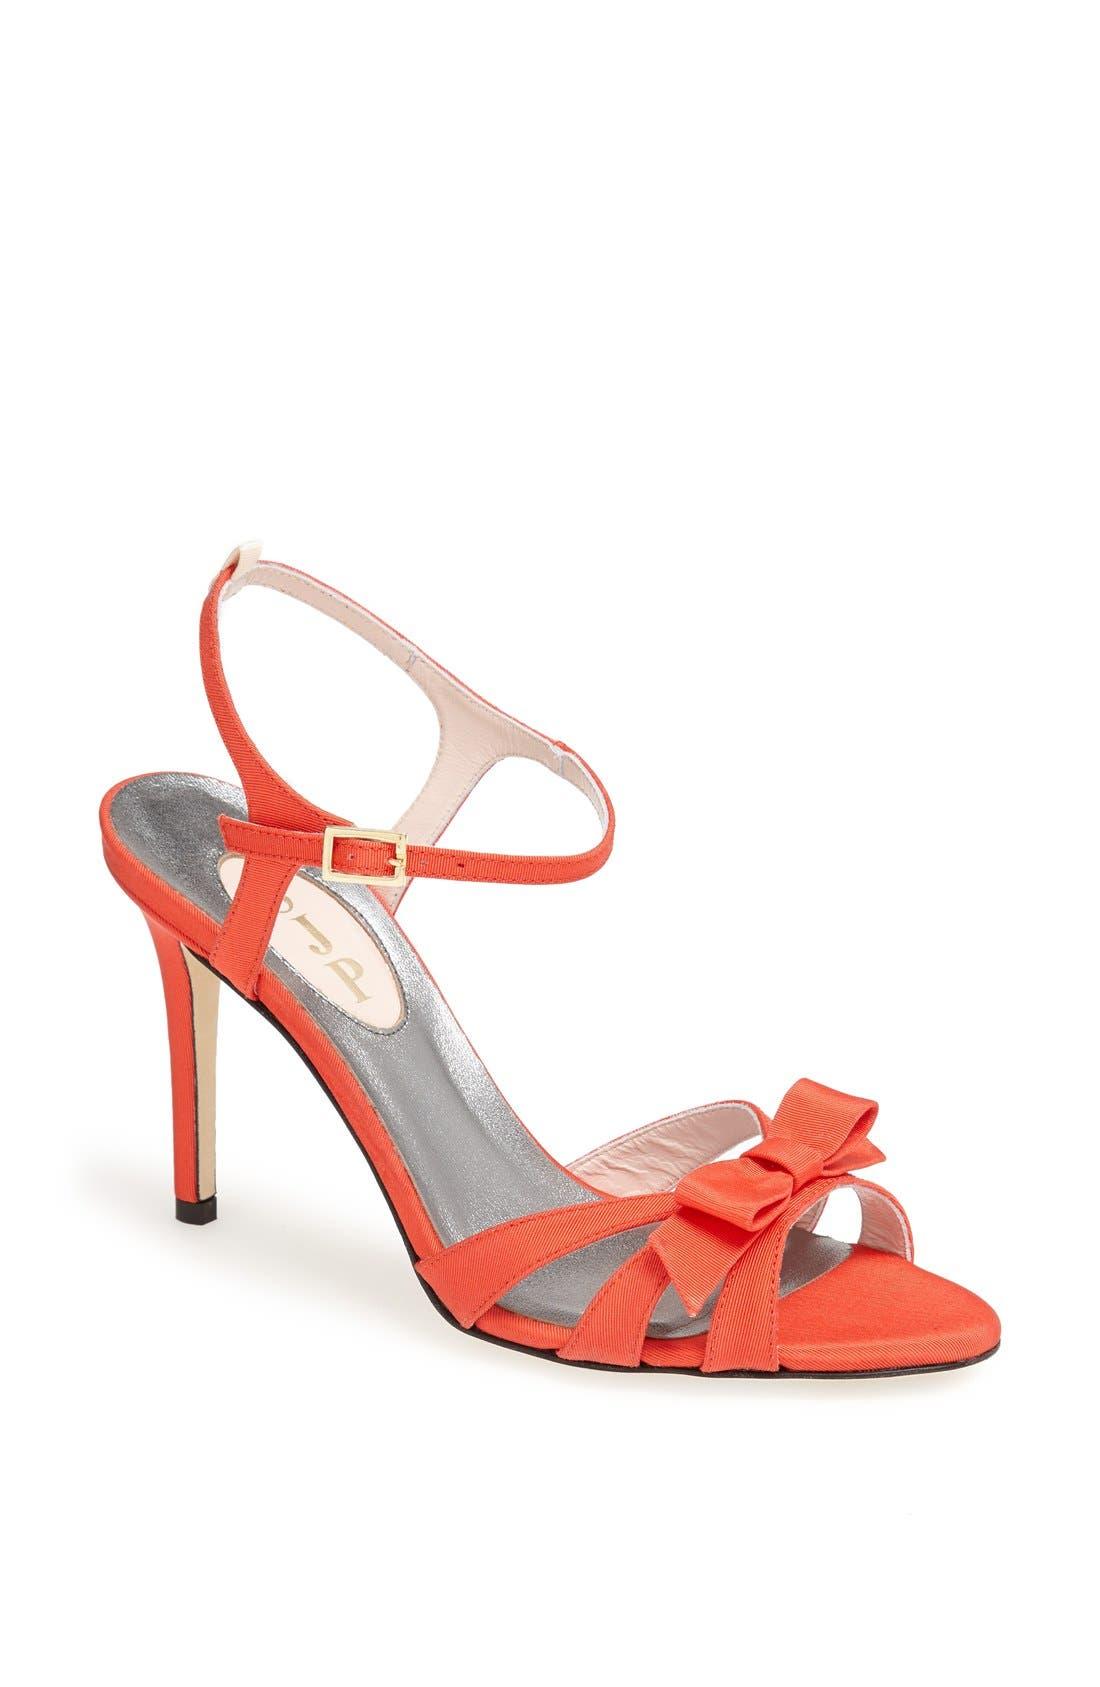 Main Image - SJP 'Silvia' Grosgrain Ankle Strap Sandal (Nordstrom Exclusive)